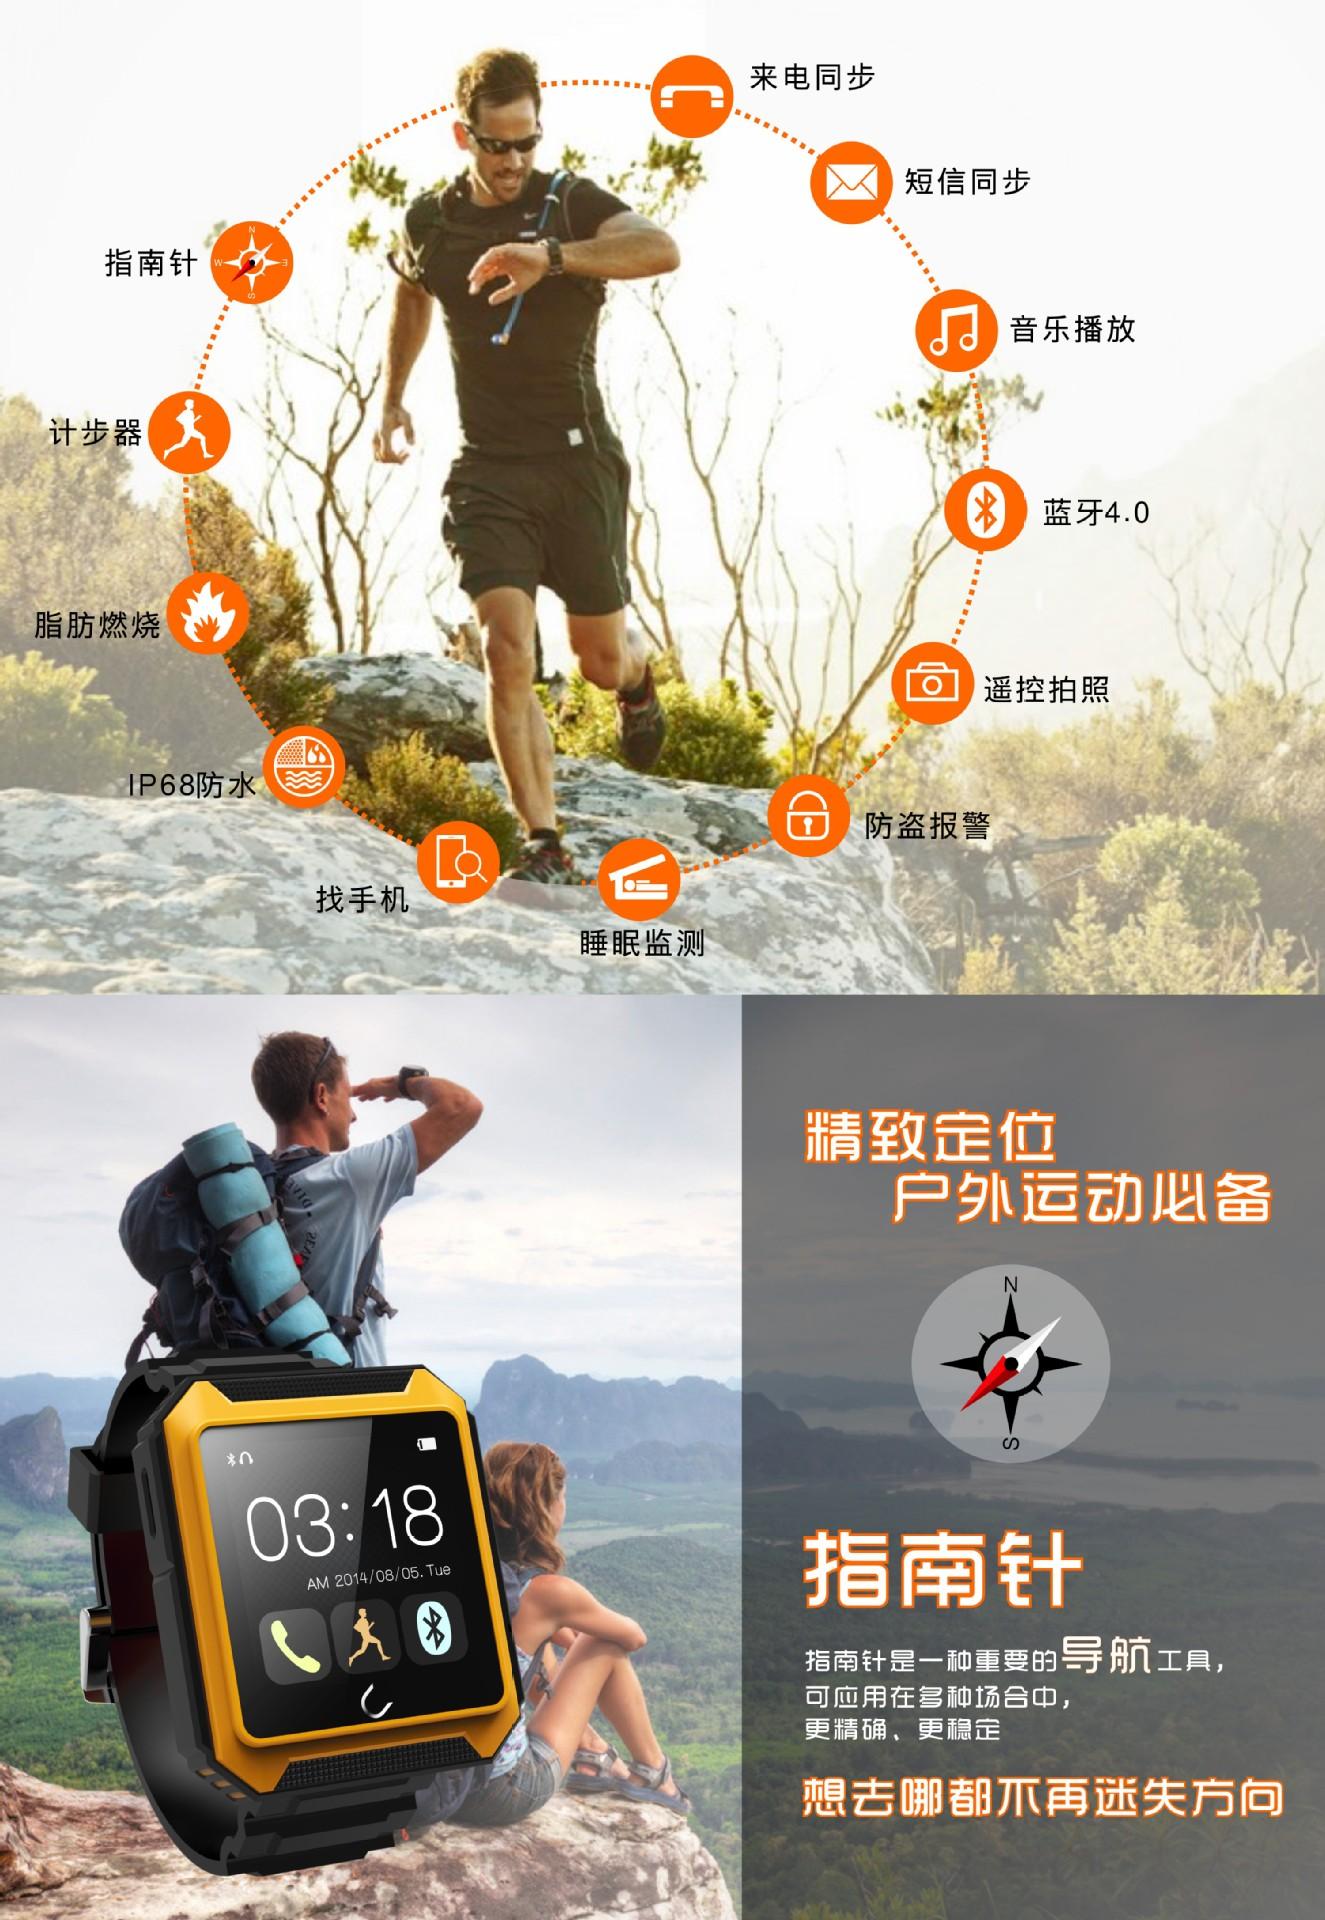 Smart watch CHR COHERETECH - Ref 3392227 Image 8